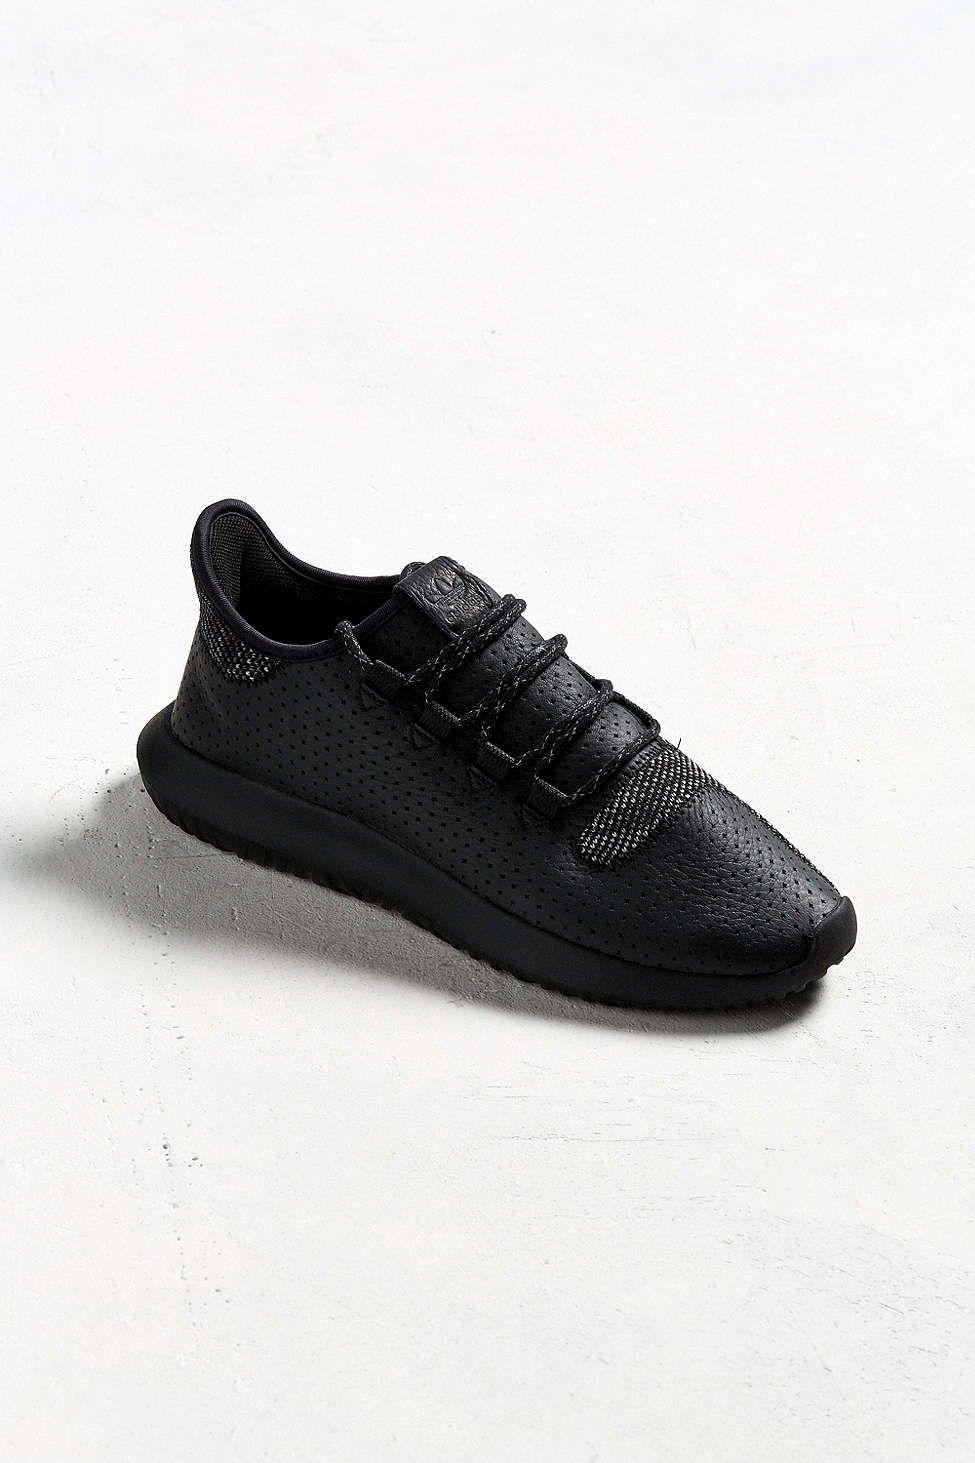 2b5e43b3f2308d adidas Tubular Shadow Sneaker Adidas Tubular Shadow